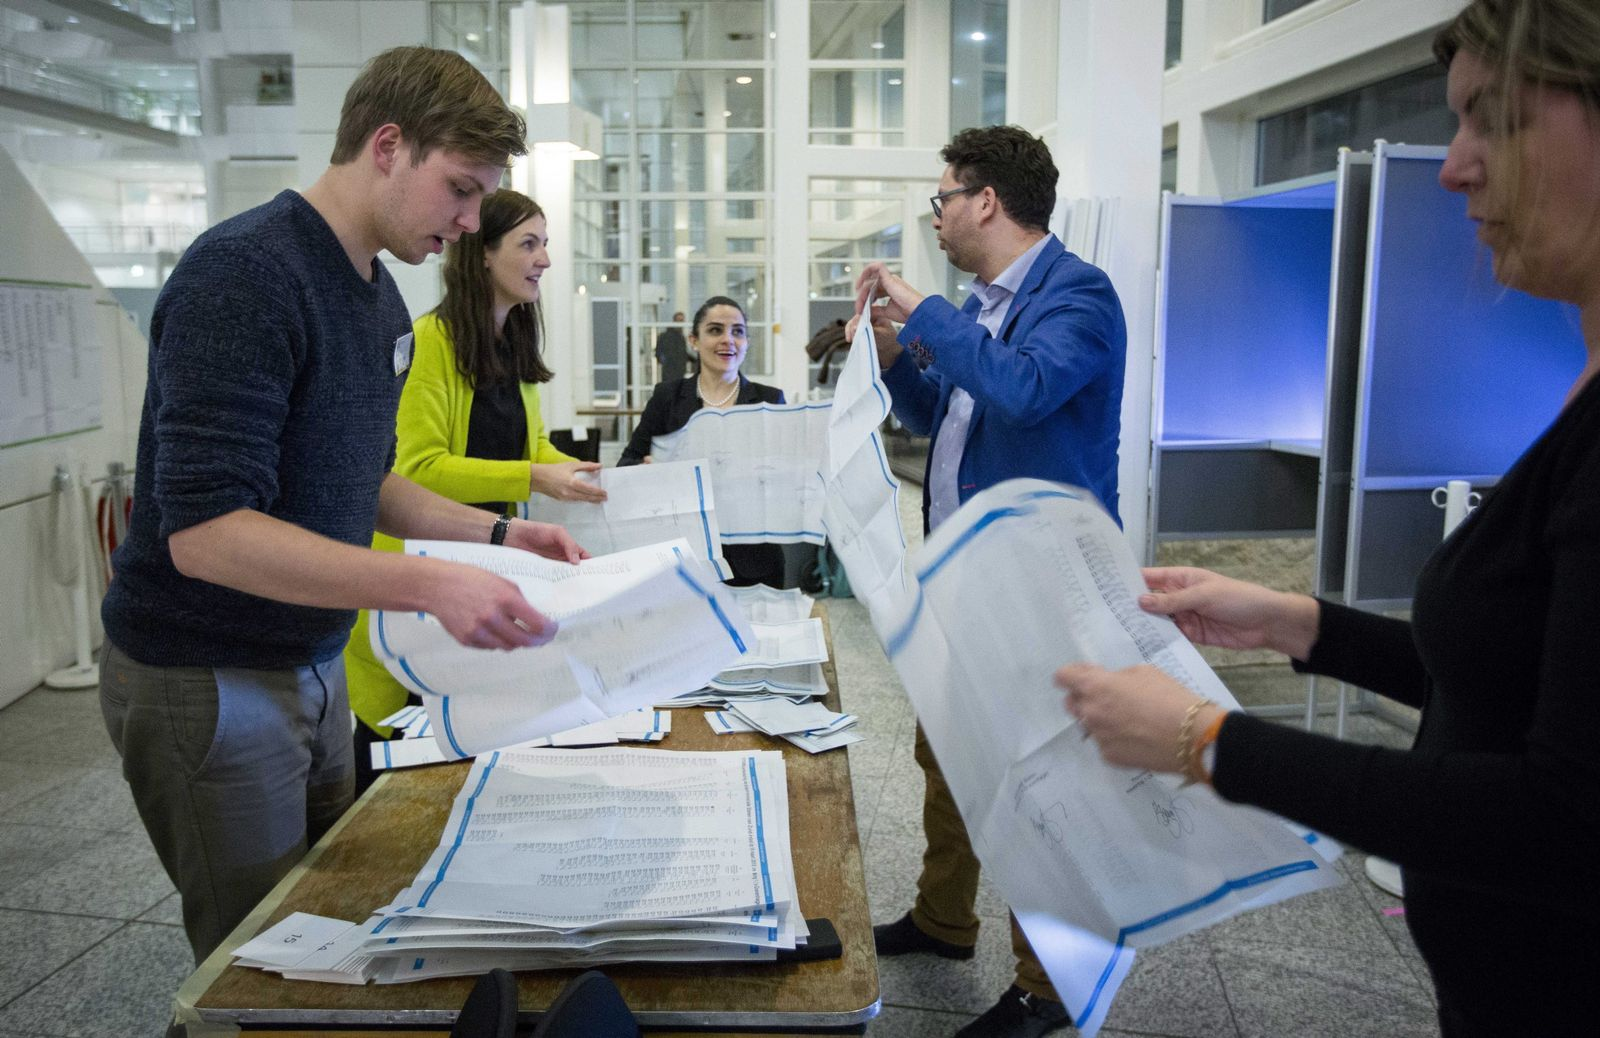 Niederlande/ Wahlen 2015